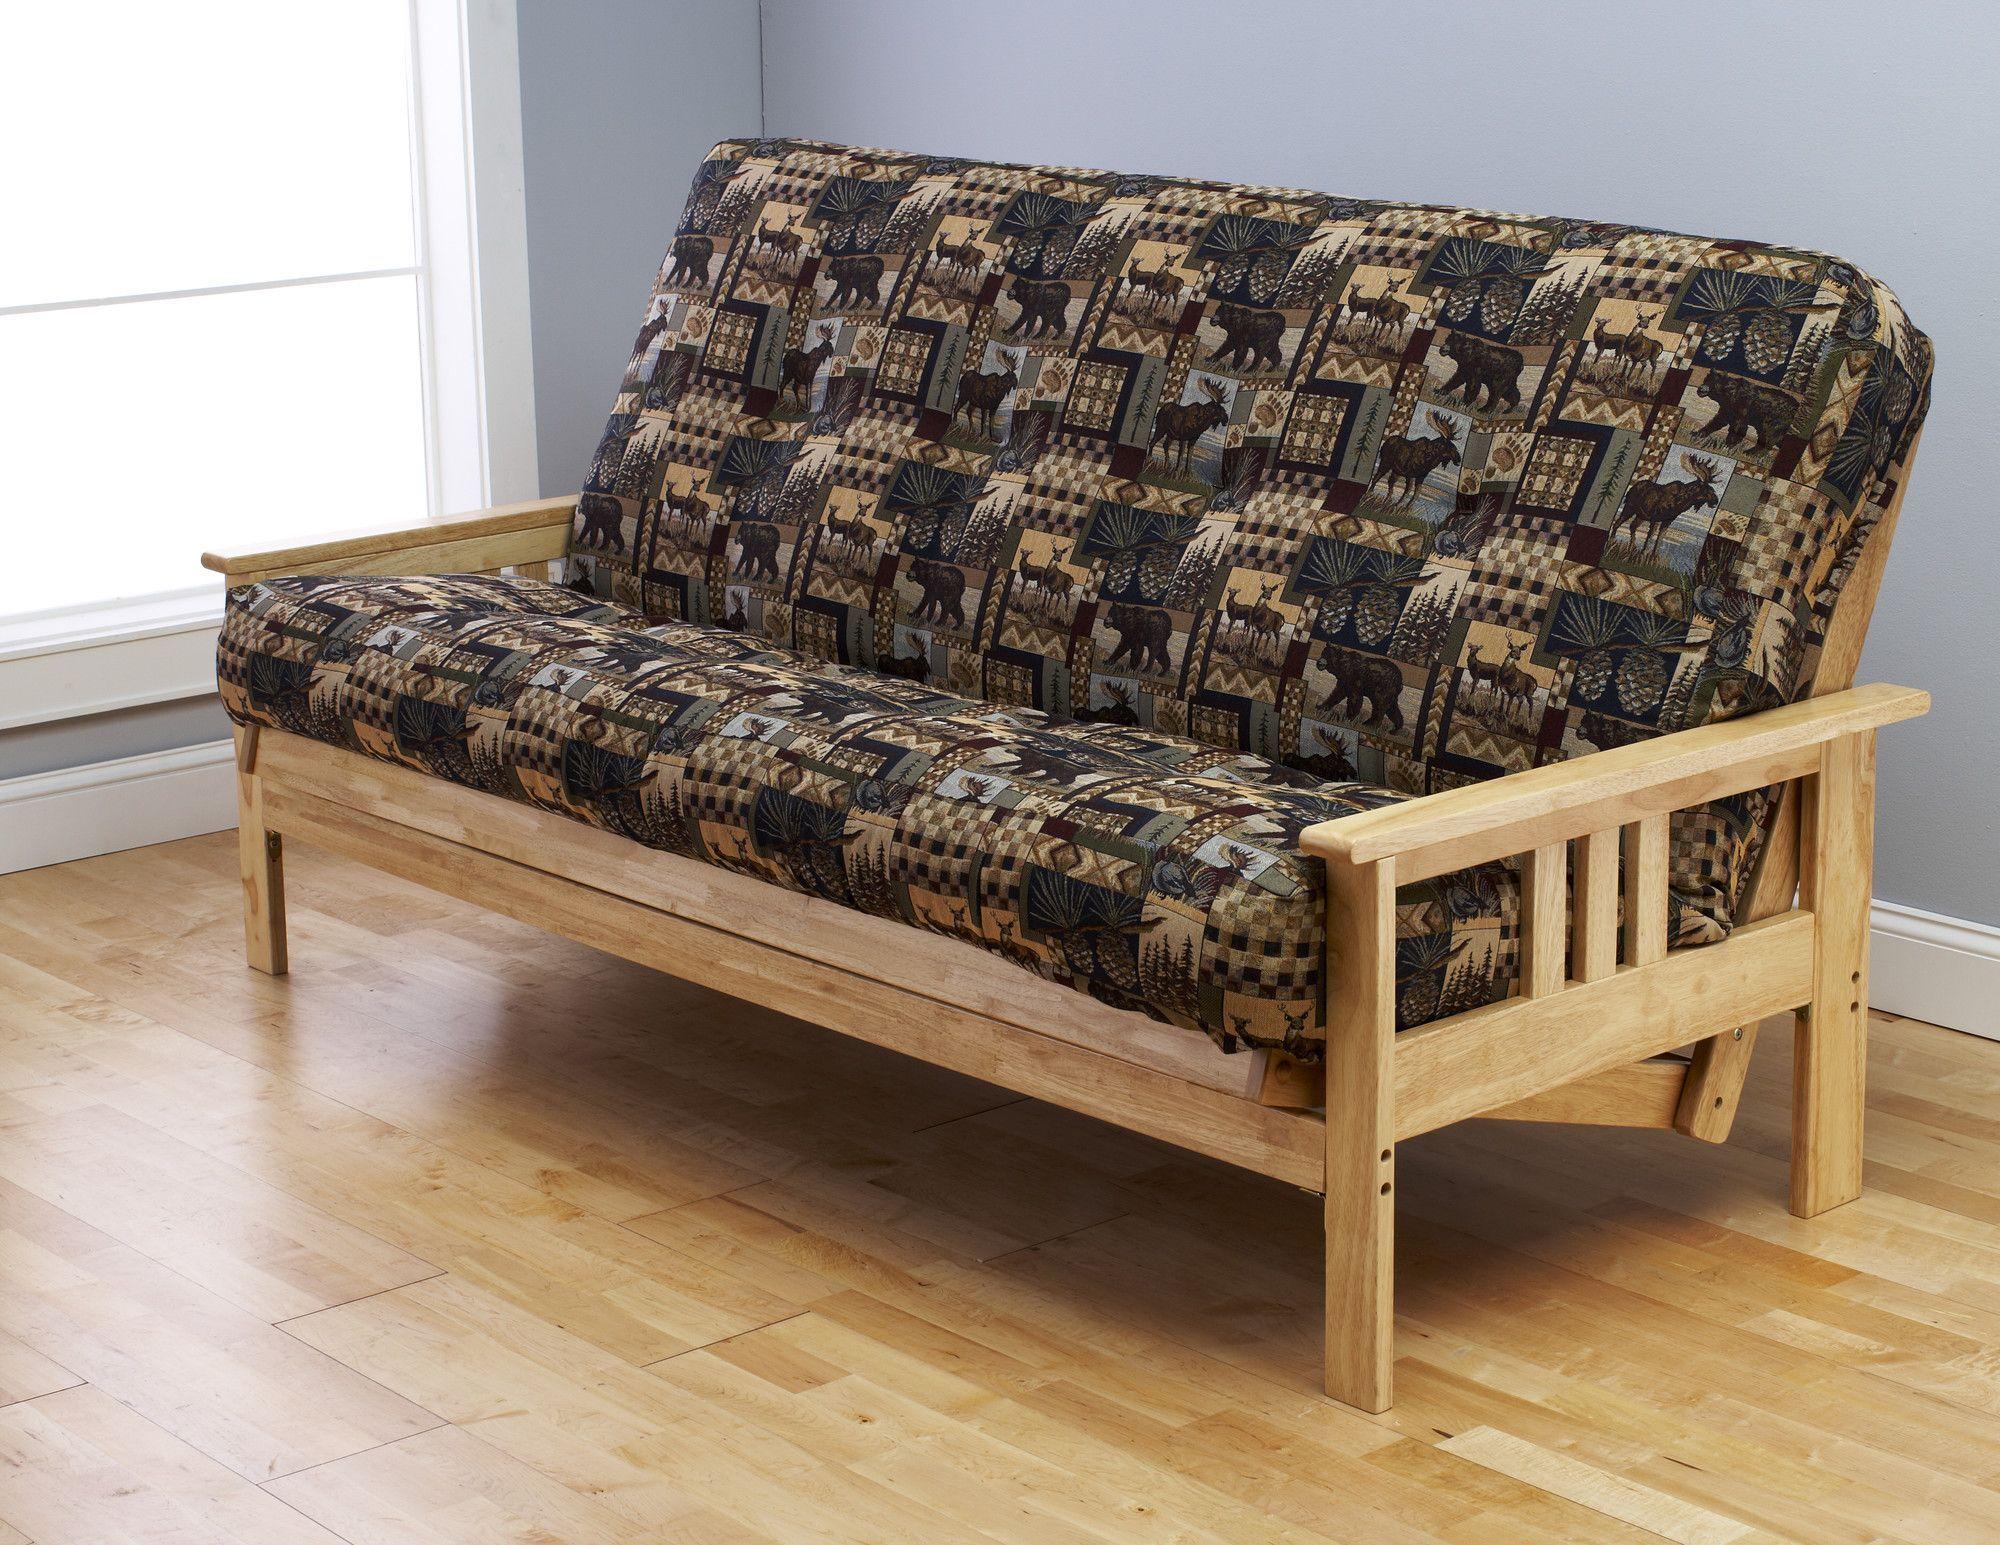 Kodiak Furniture Monterey Peter's Cabin Futon and Mattress